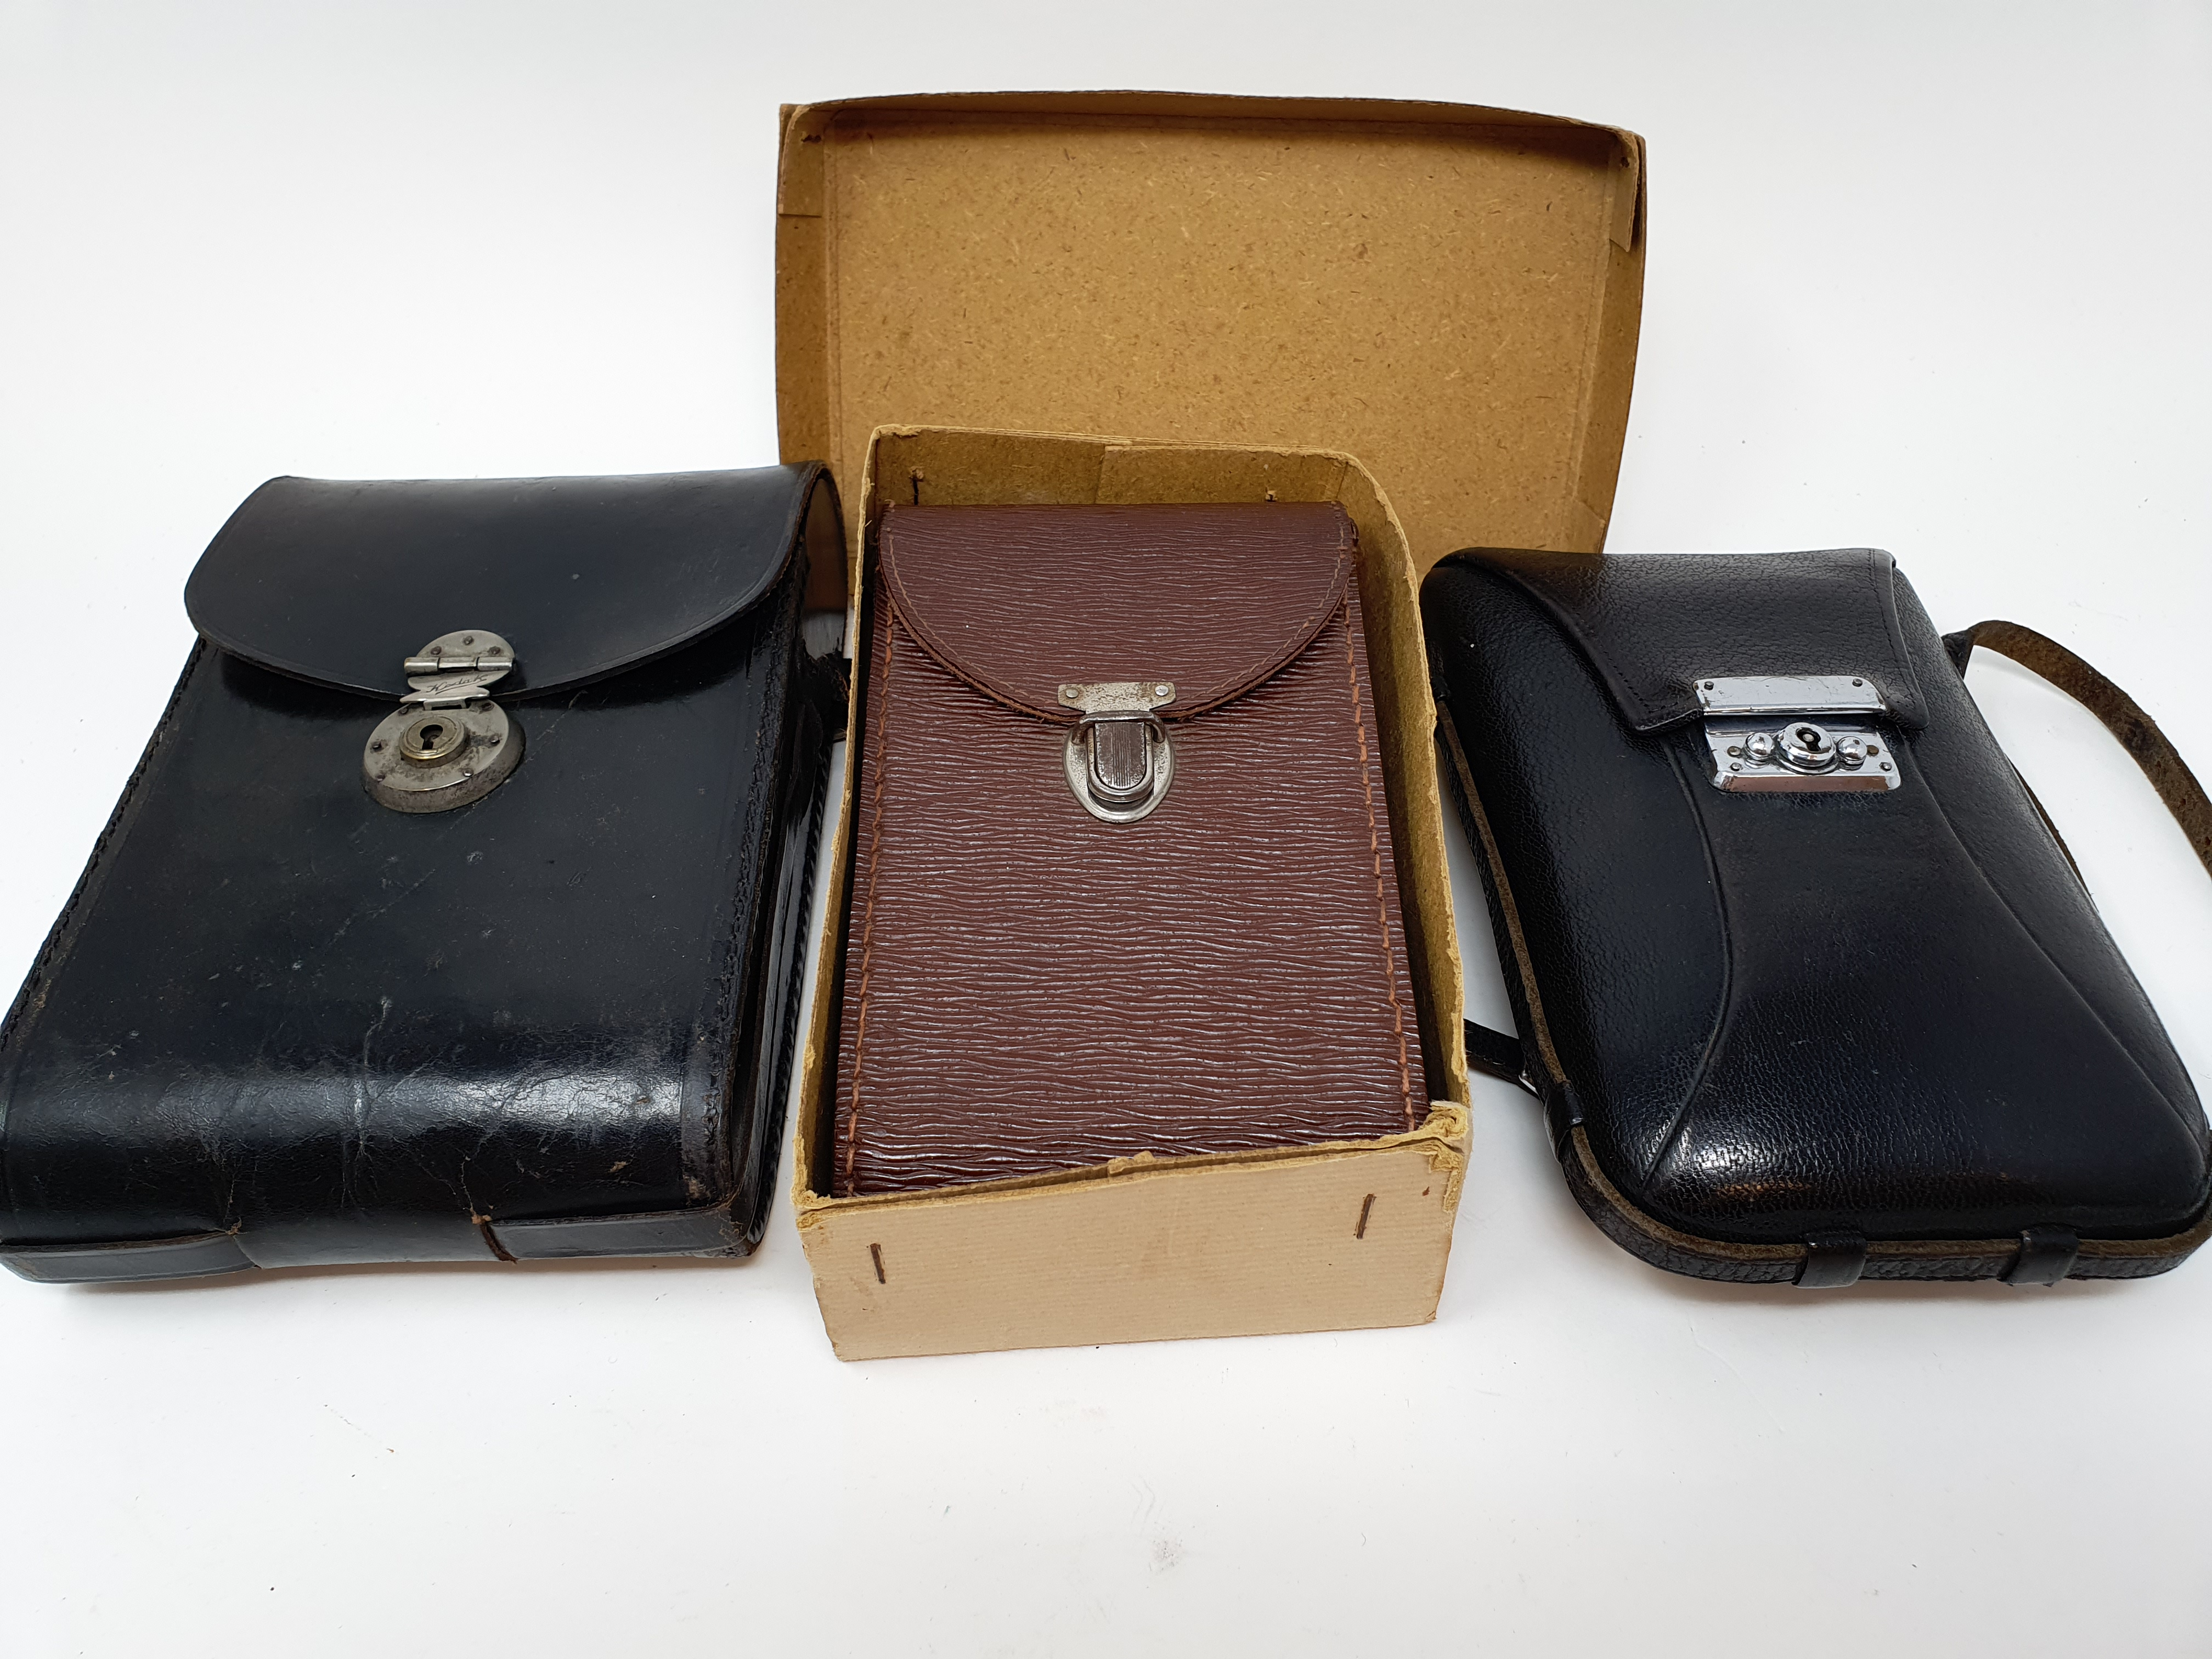 A Kodak Regent folding camera, with leather outer case, a Kodak folding camera, with leather outer - Image 6 of 6